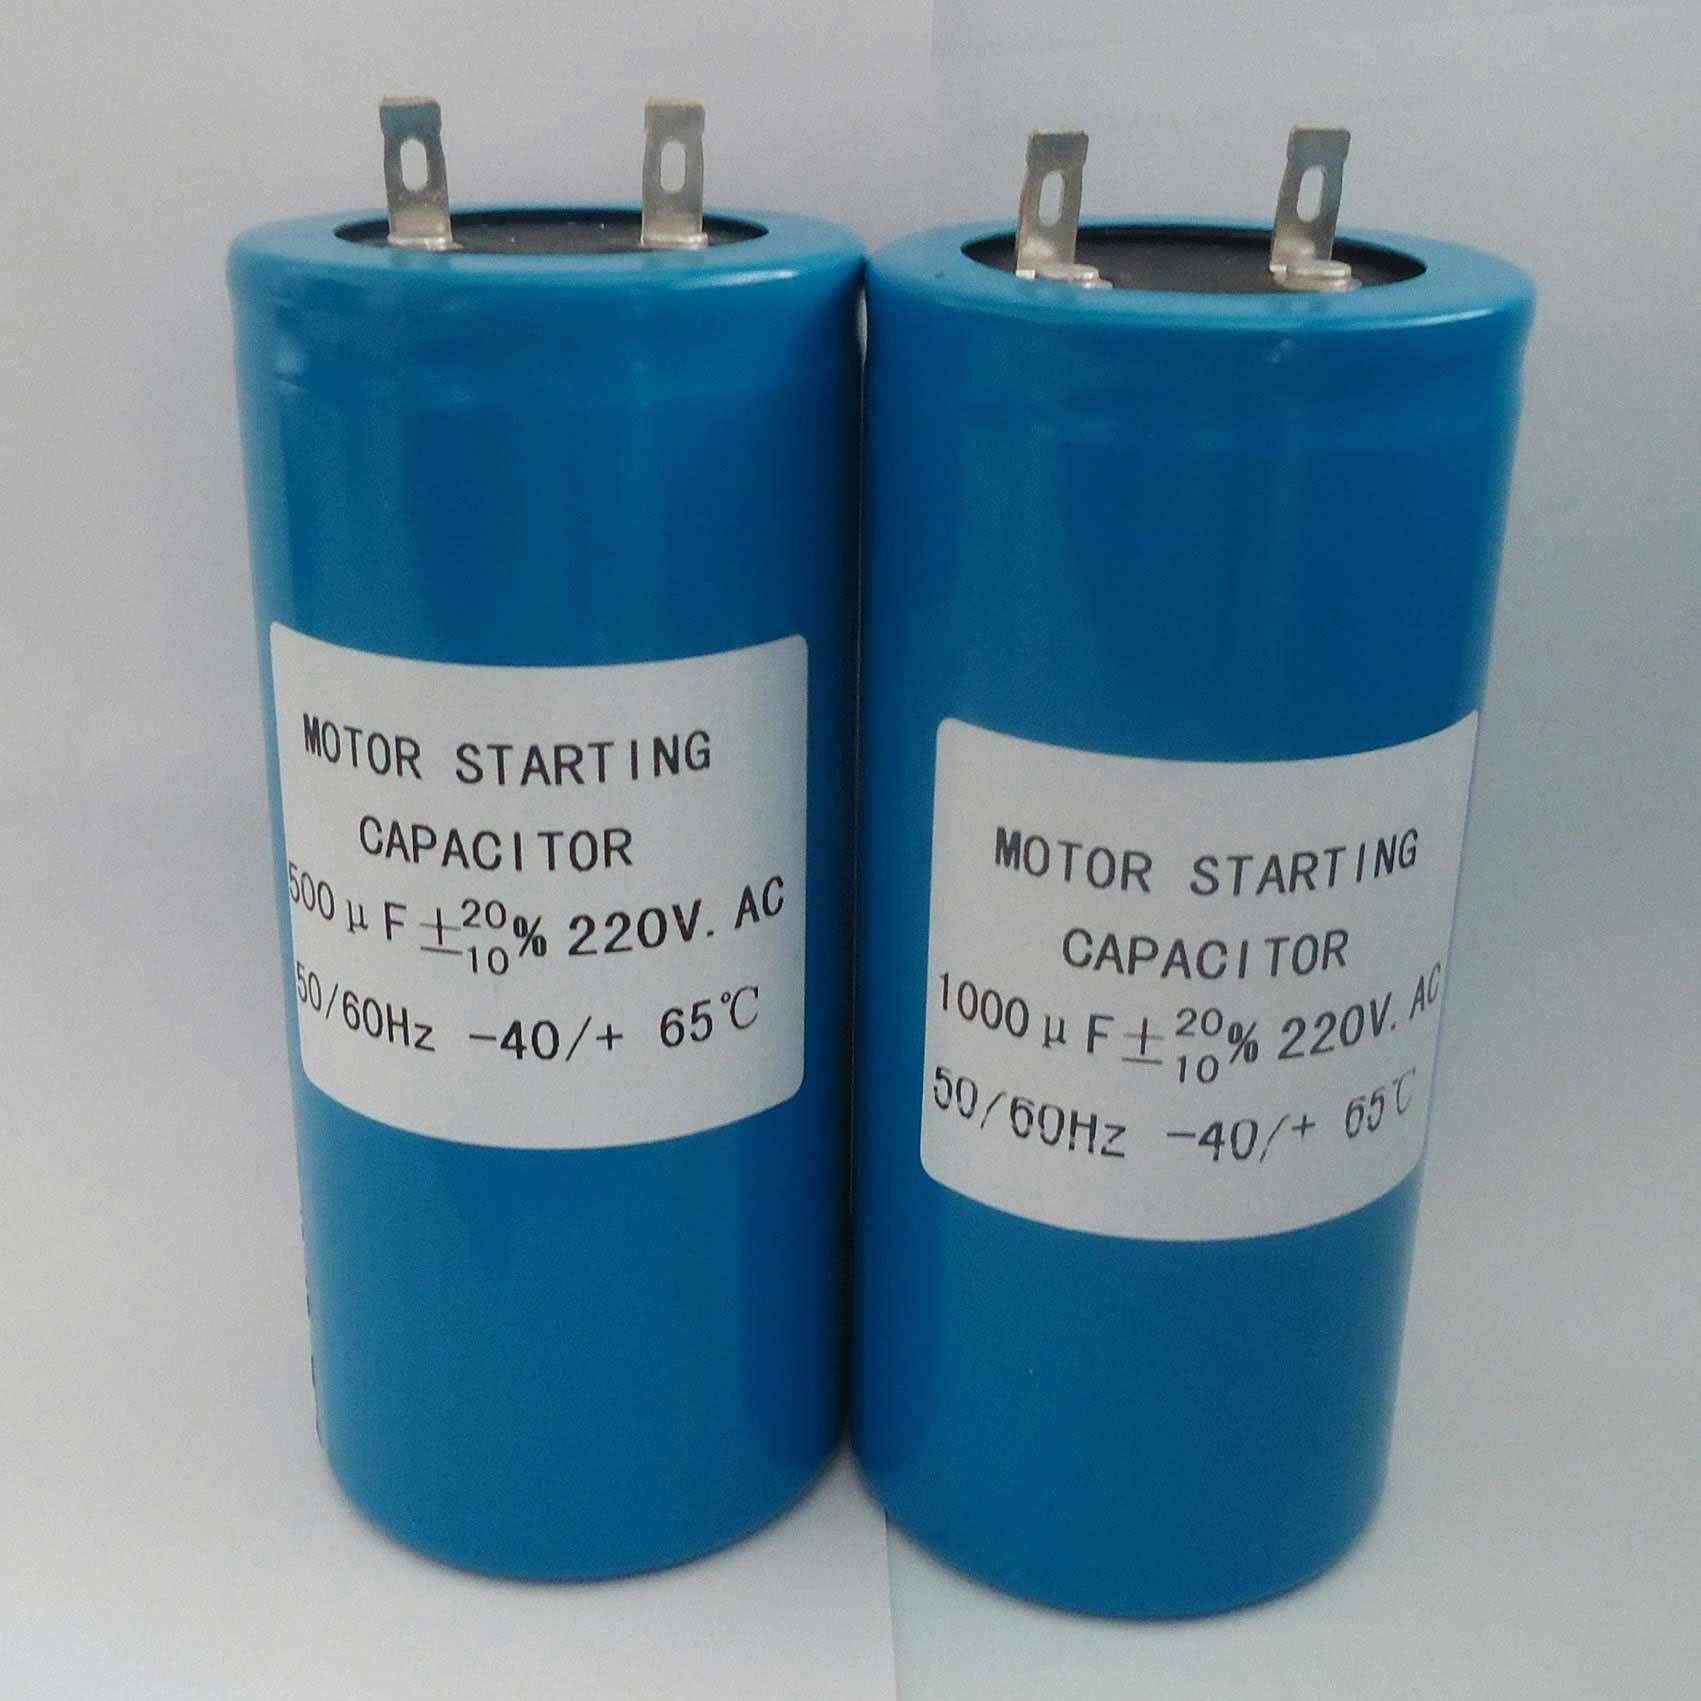 [Hot Item] Unpolarized Electrolytic Capacitor 500 or 1000 Micro Farad 220VAC